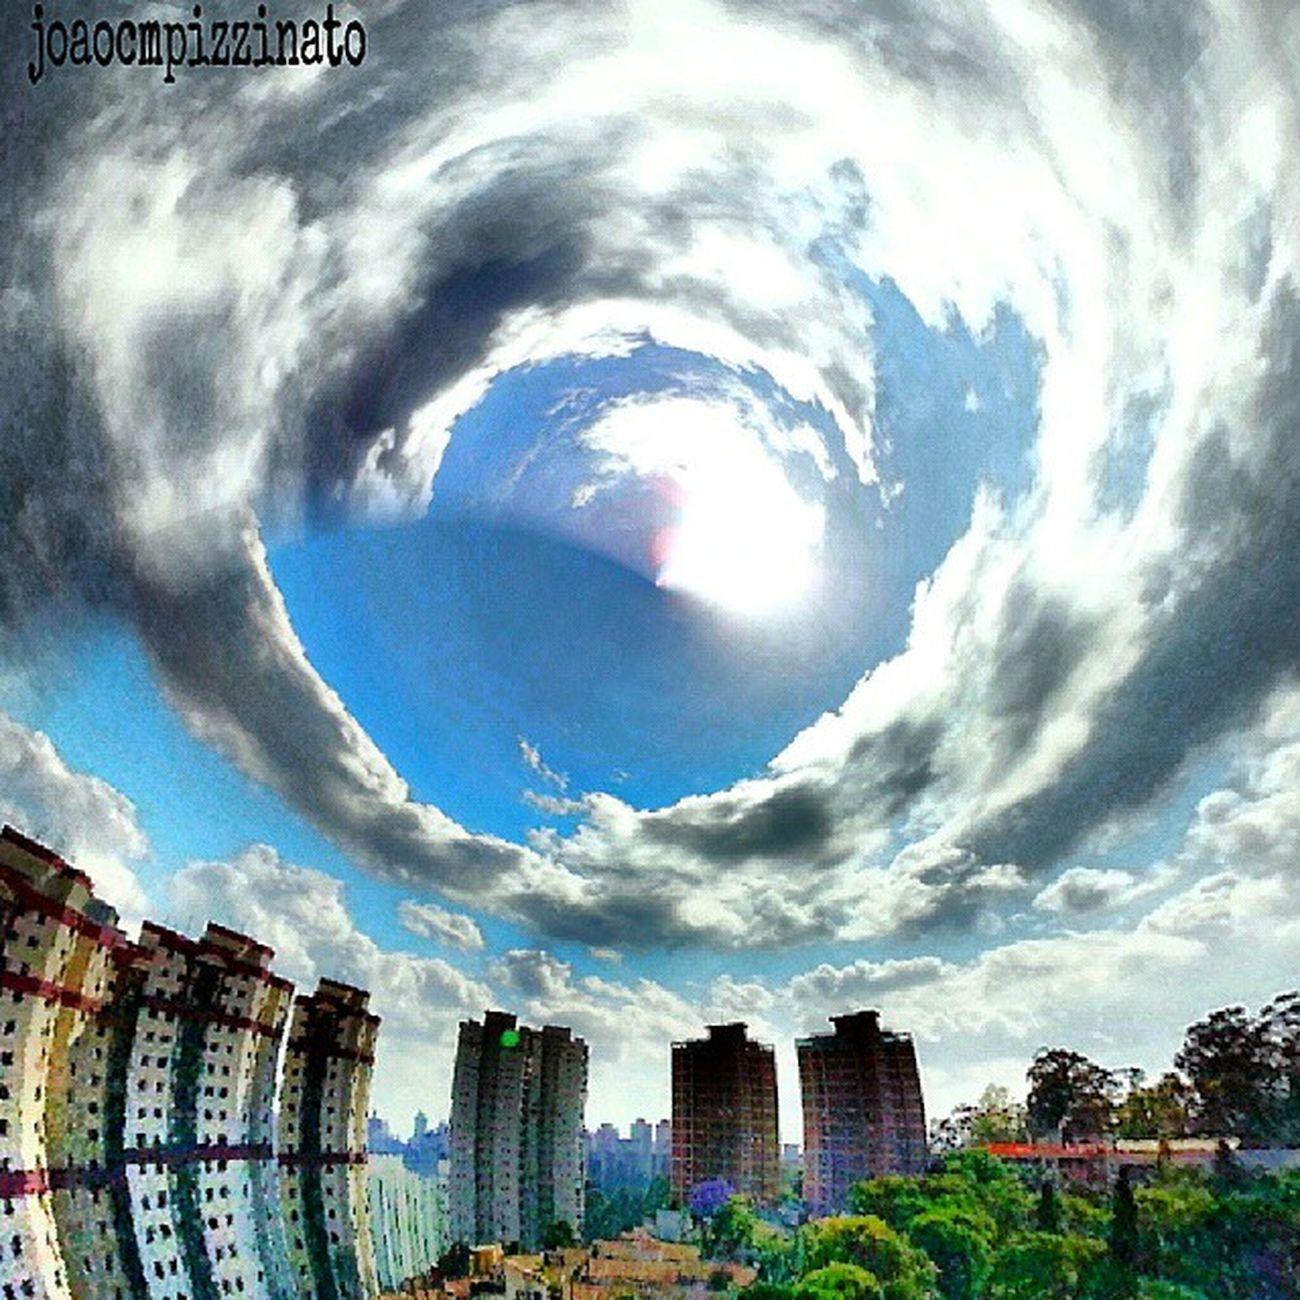 Tiny Planet FX. Tinyplanetfx Colors Effect Edited city zonasul saopaulo brasil photography fortheloveofediting